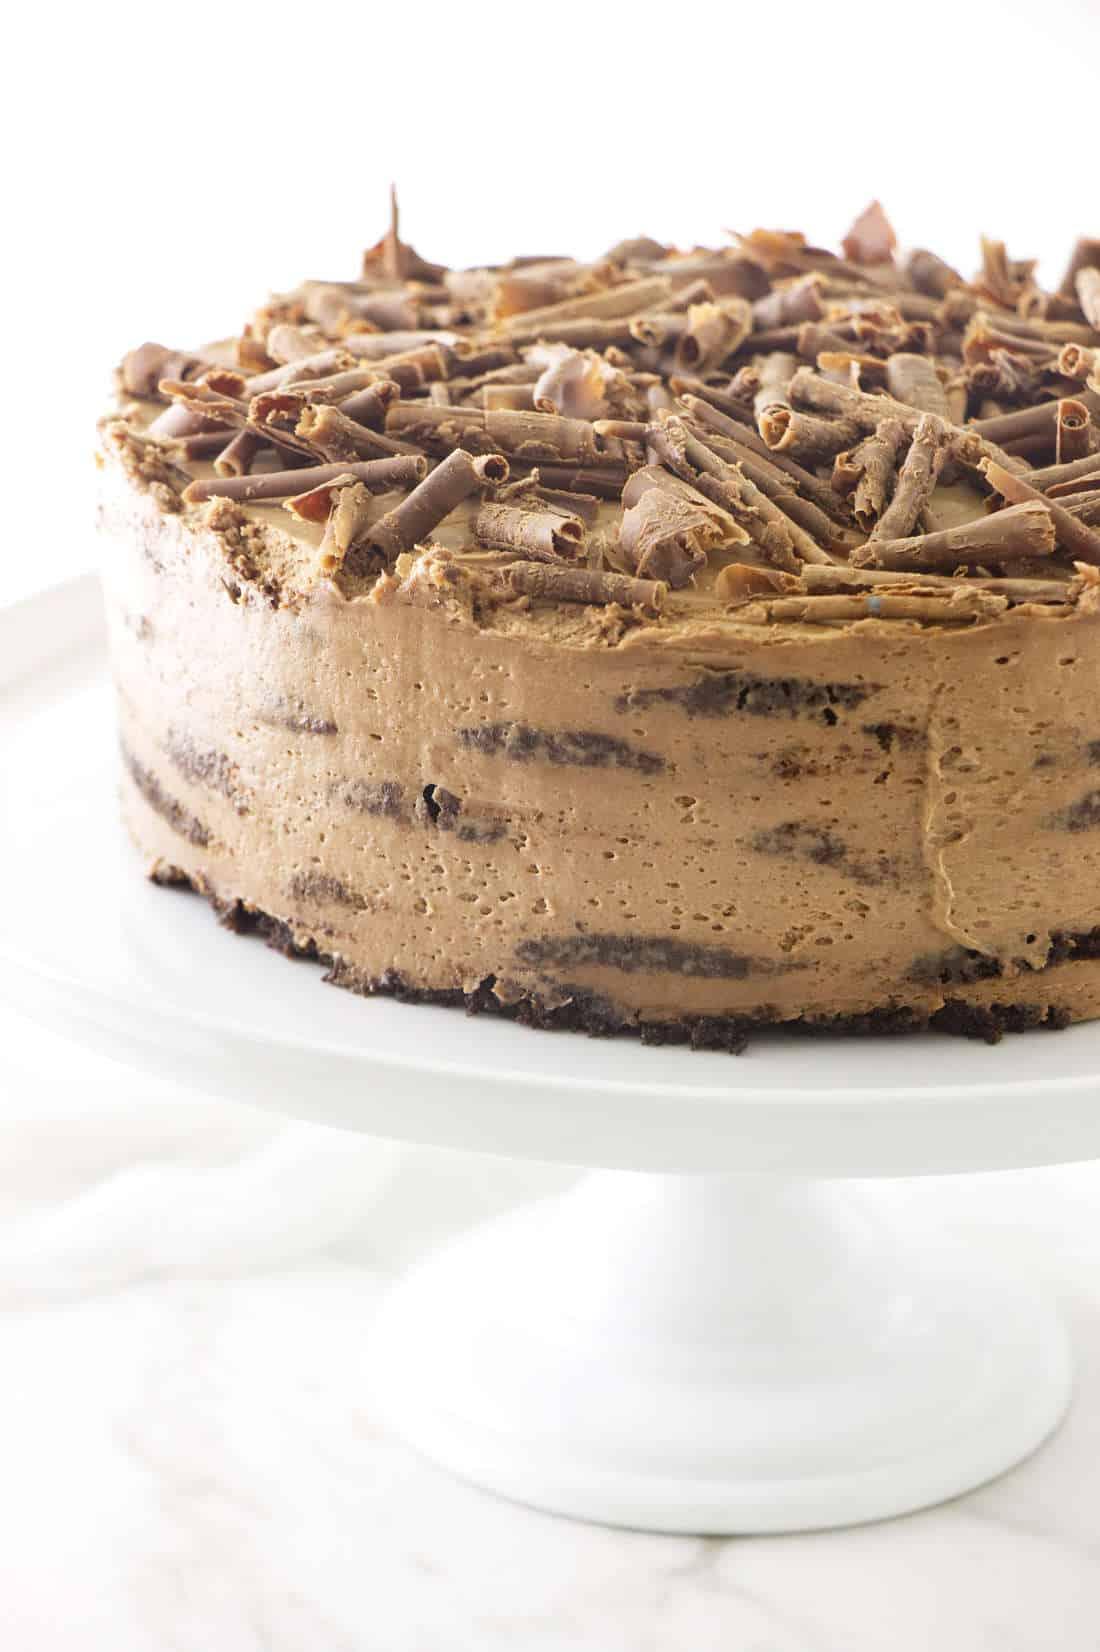 Chocolate Peanut Butter Refrigerator Cake